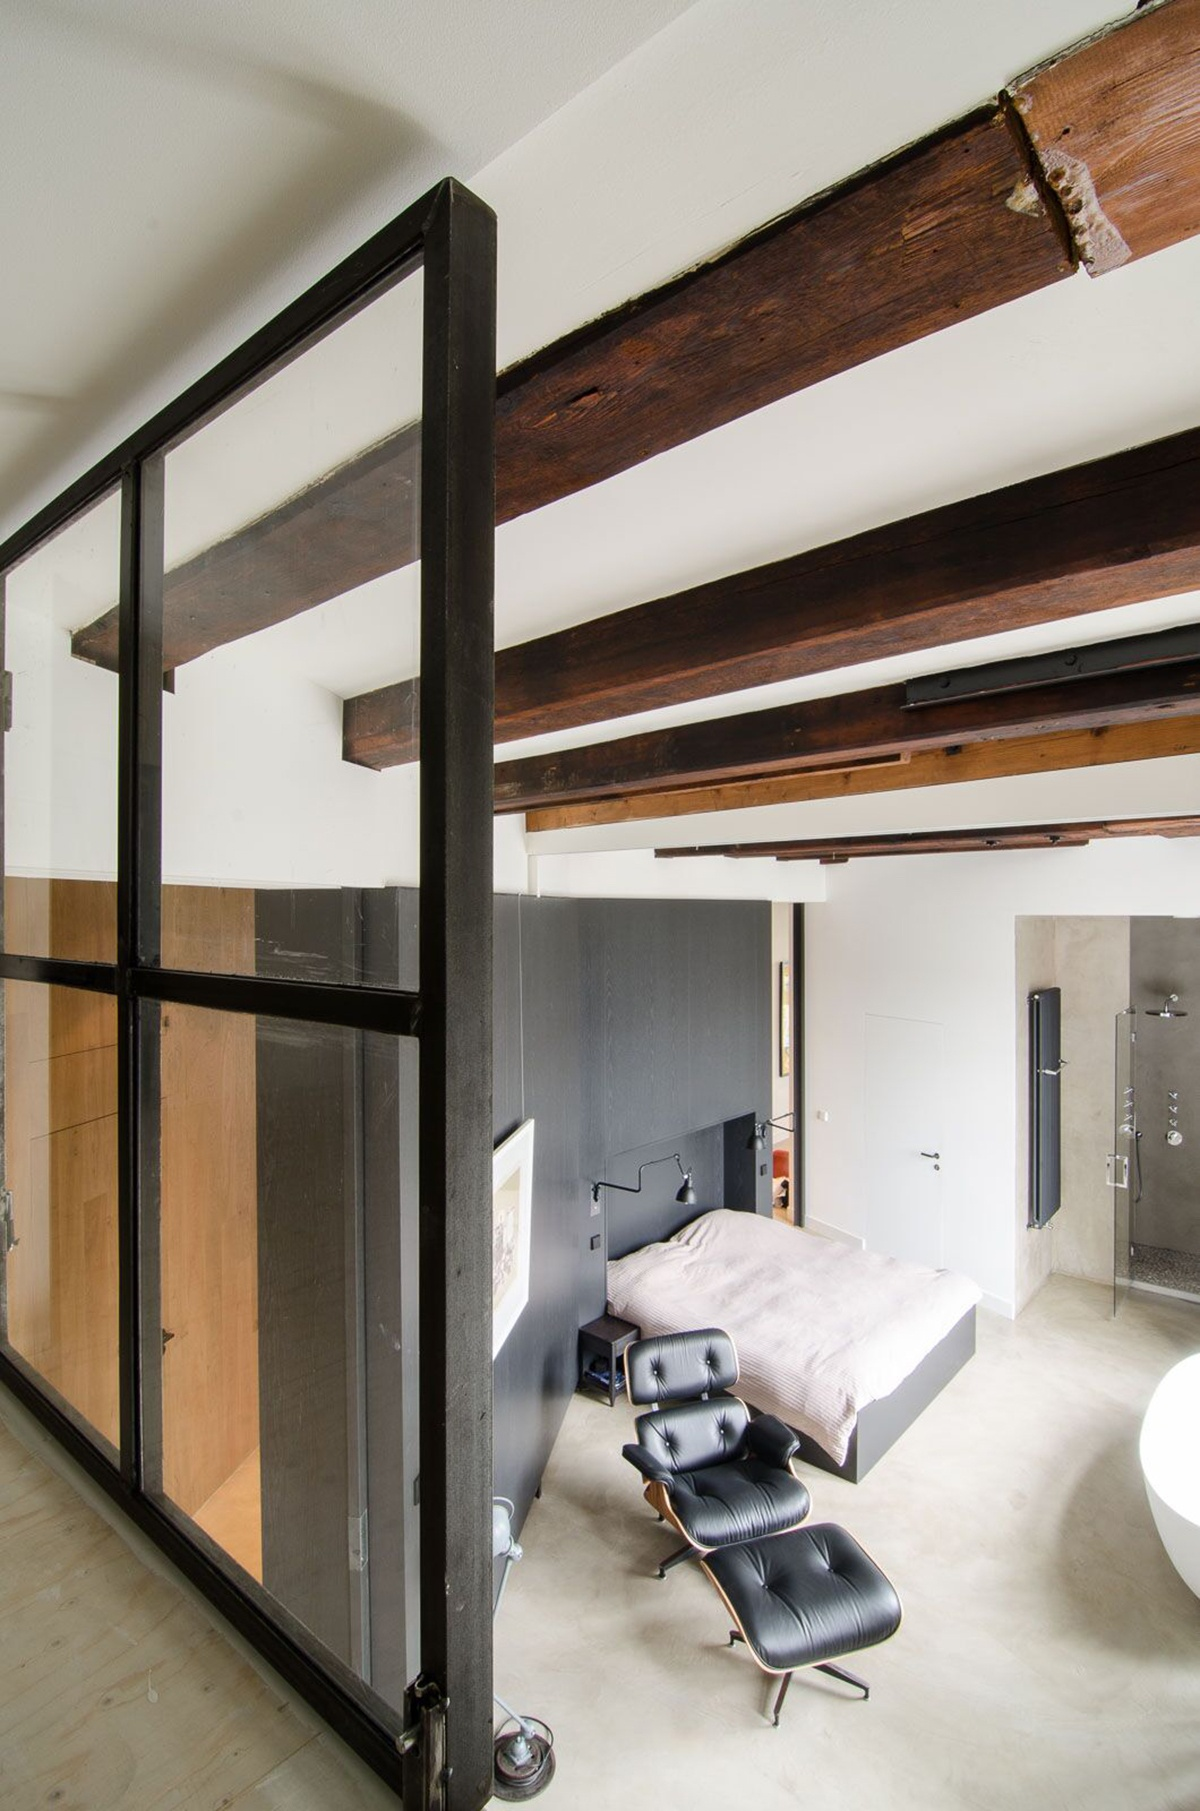 old-sugar-factory-was-converted-into-contemporary-loft-14